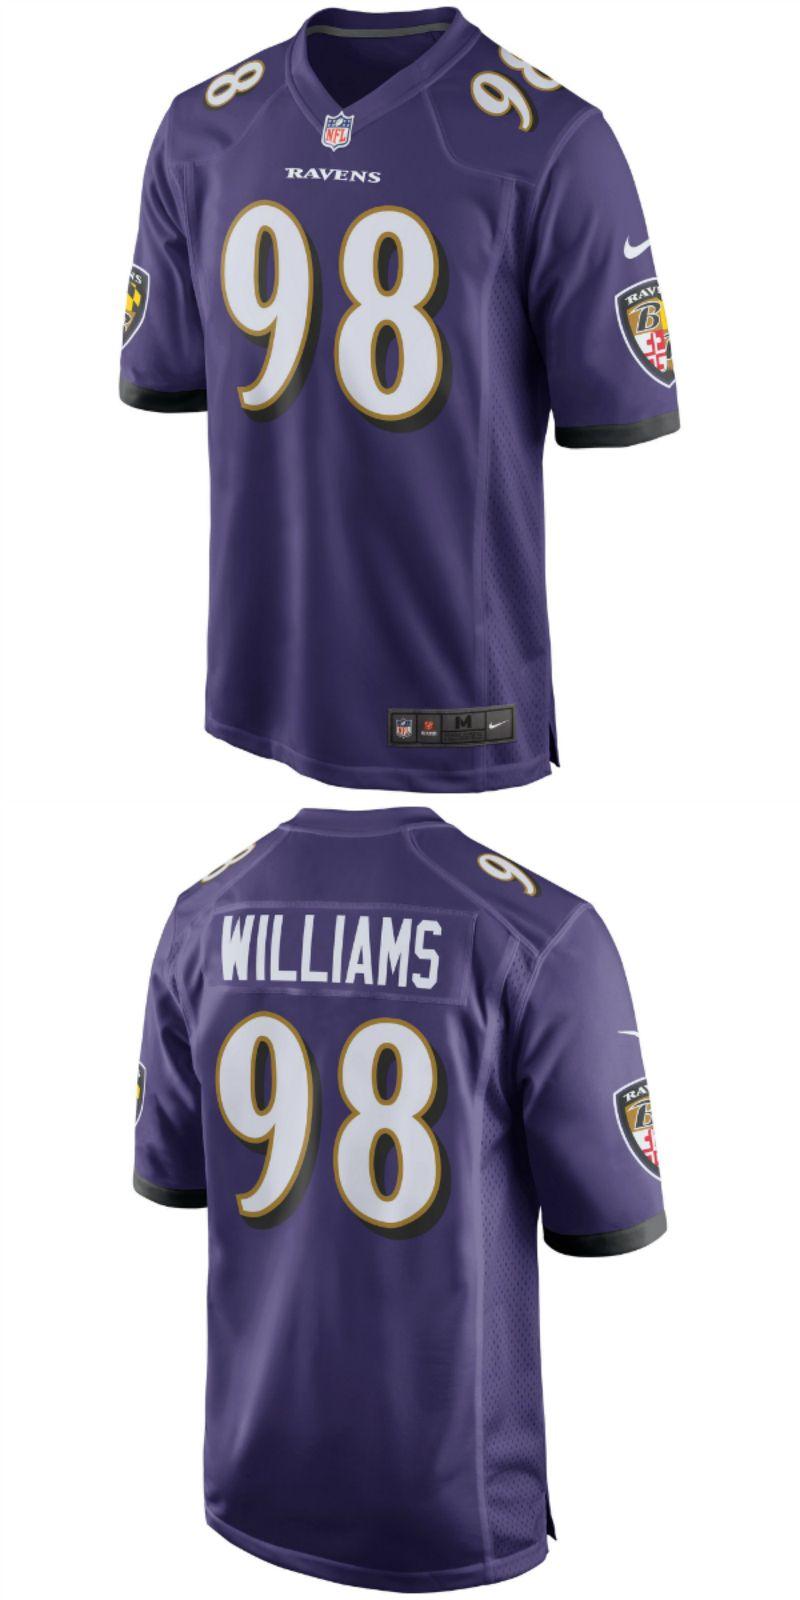 uk availability 05b4c 07ca3 Brandon Williams Baltimore Ravens Nike Game Jersey PurpleBaltimore Ravens  Superbowl